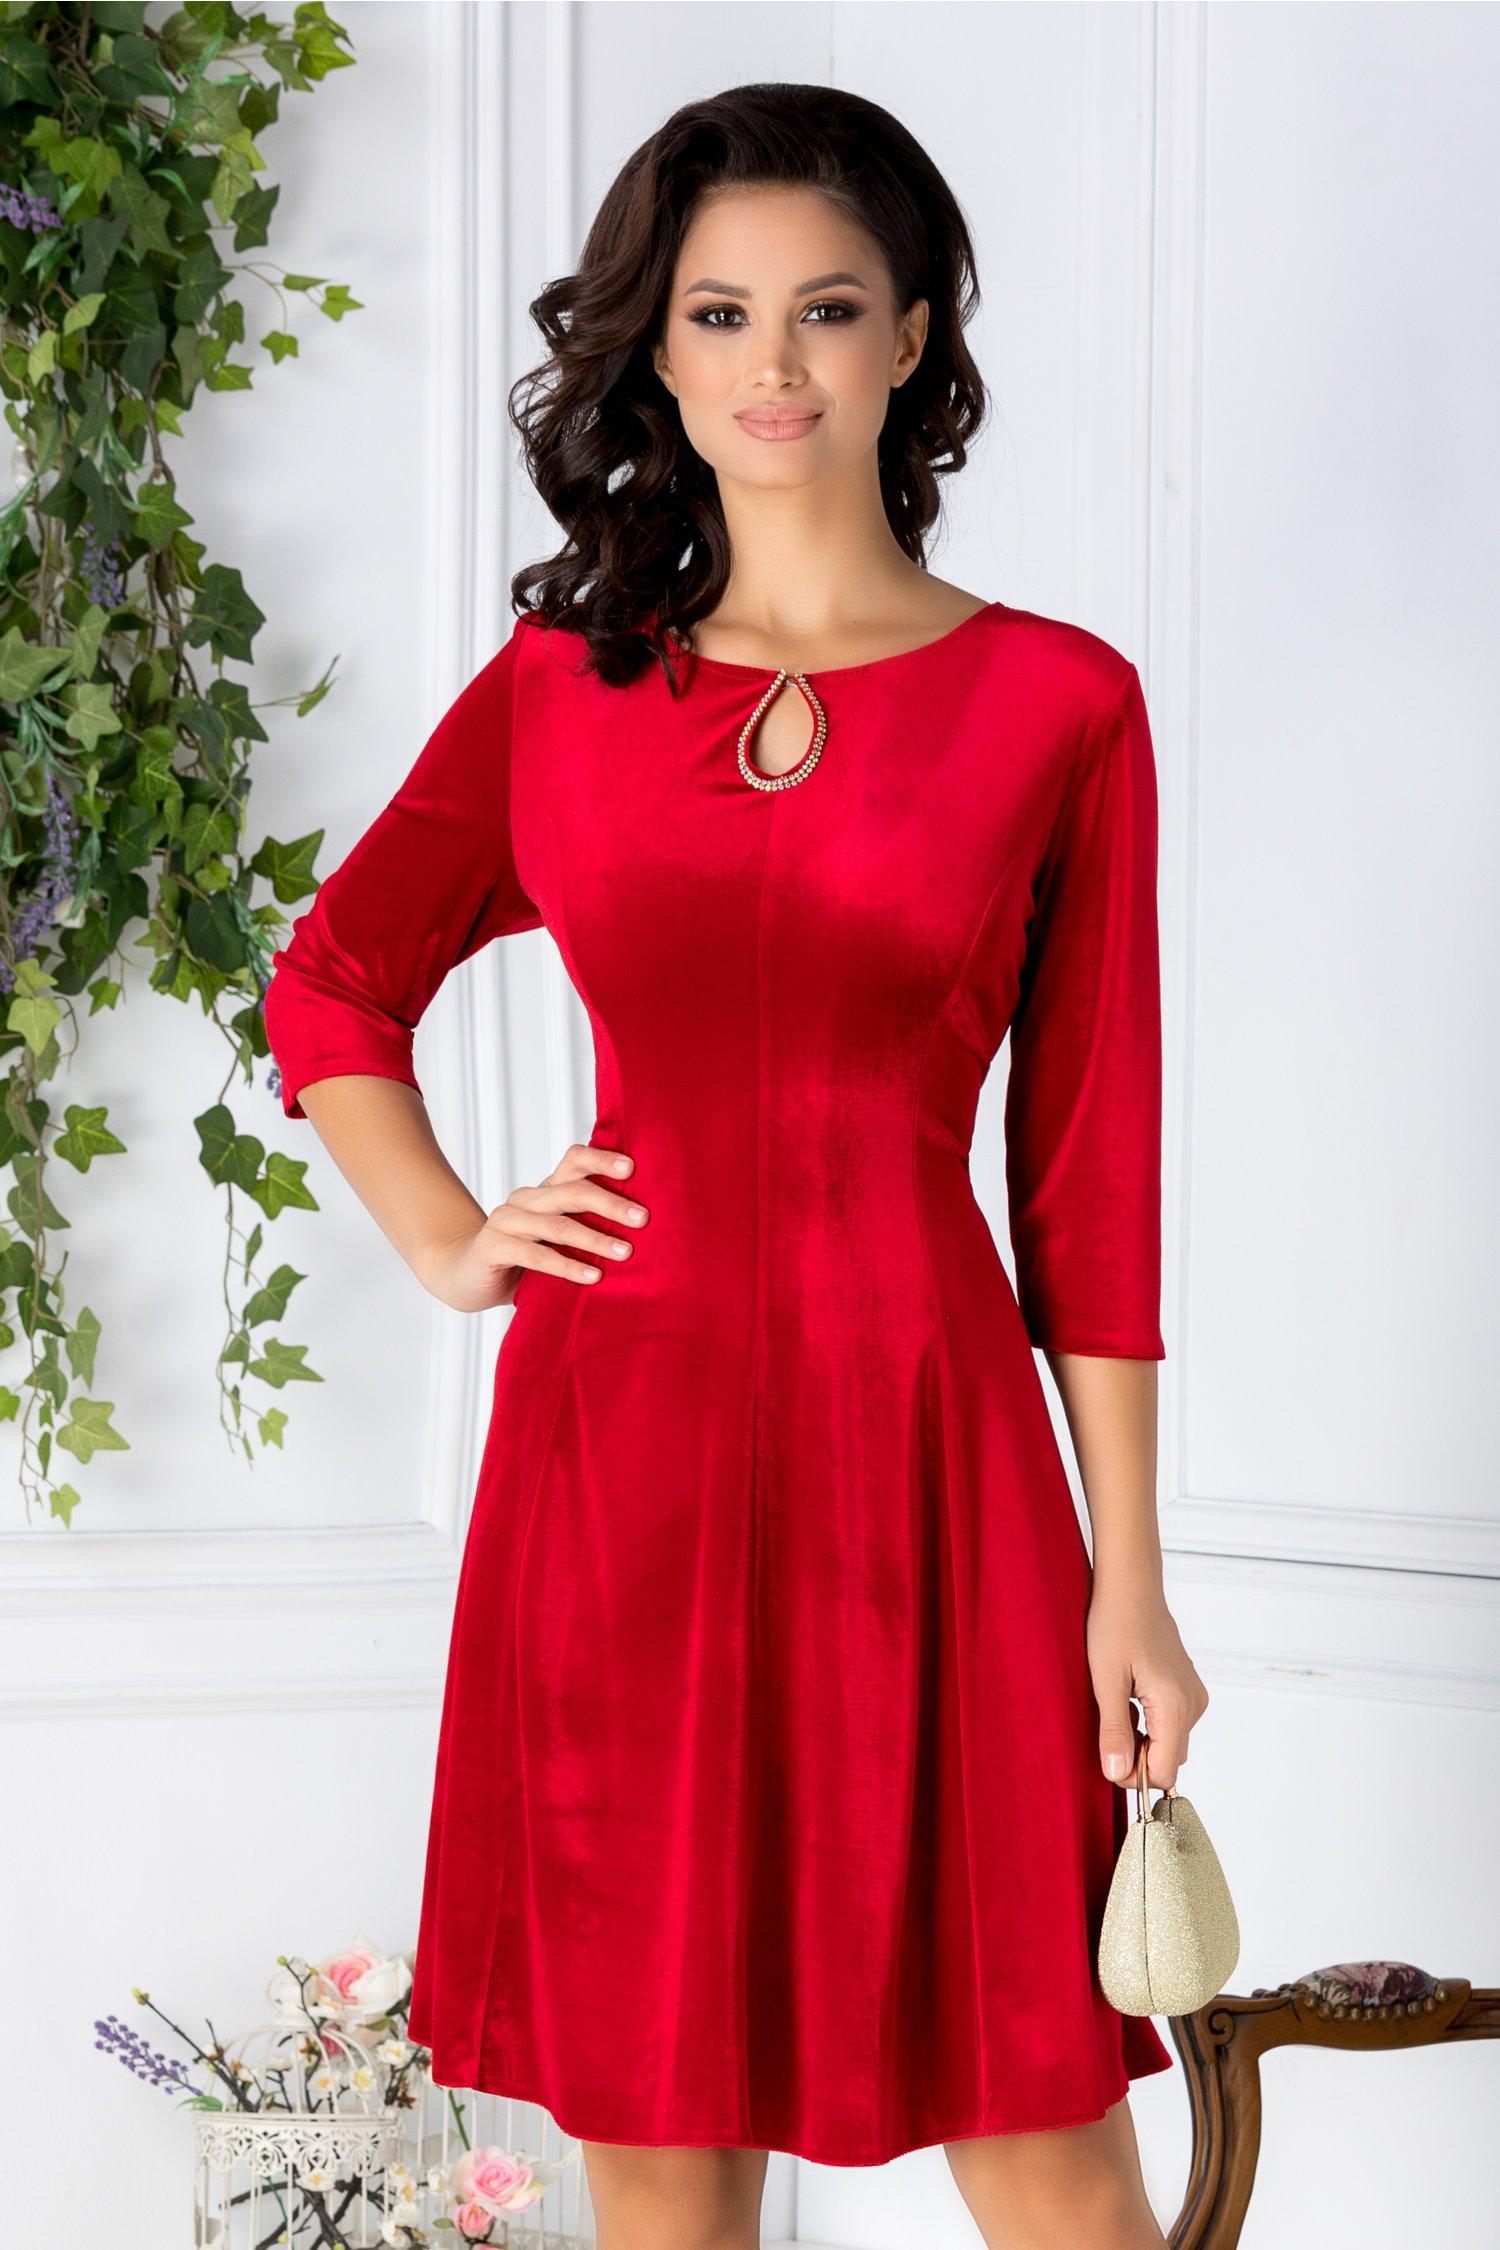 Rochie Velvet rosie de ocazie din catifea